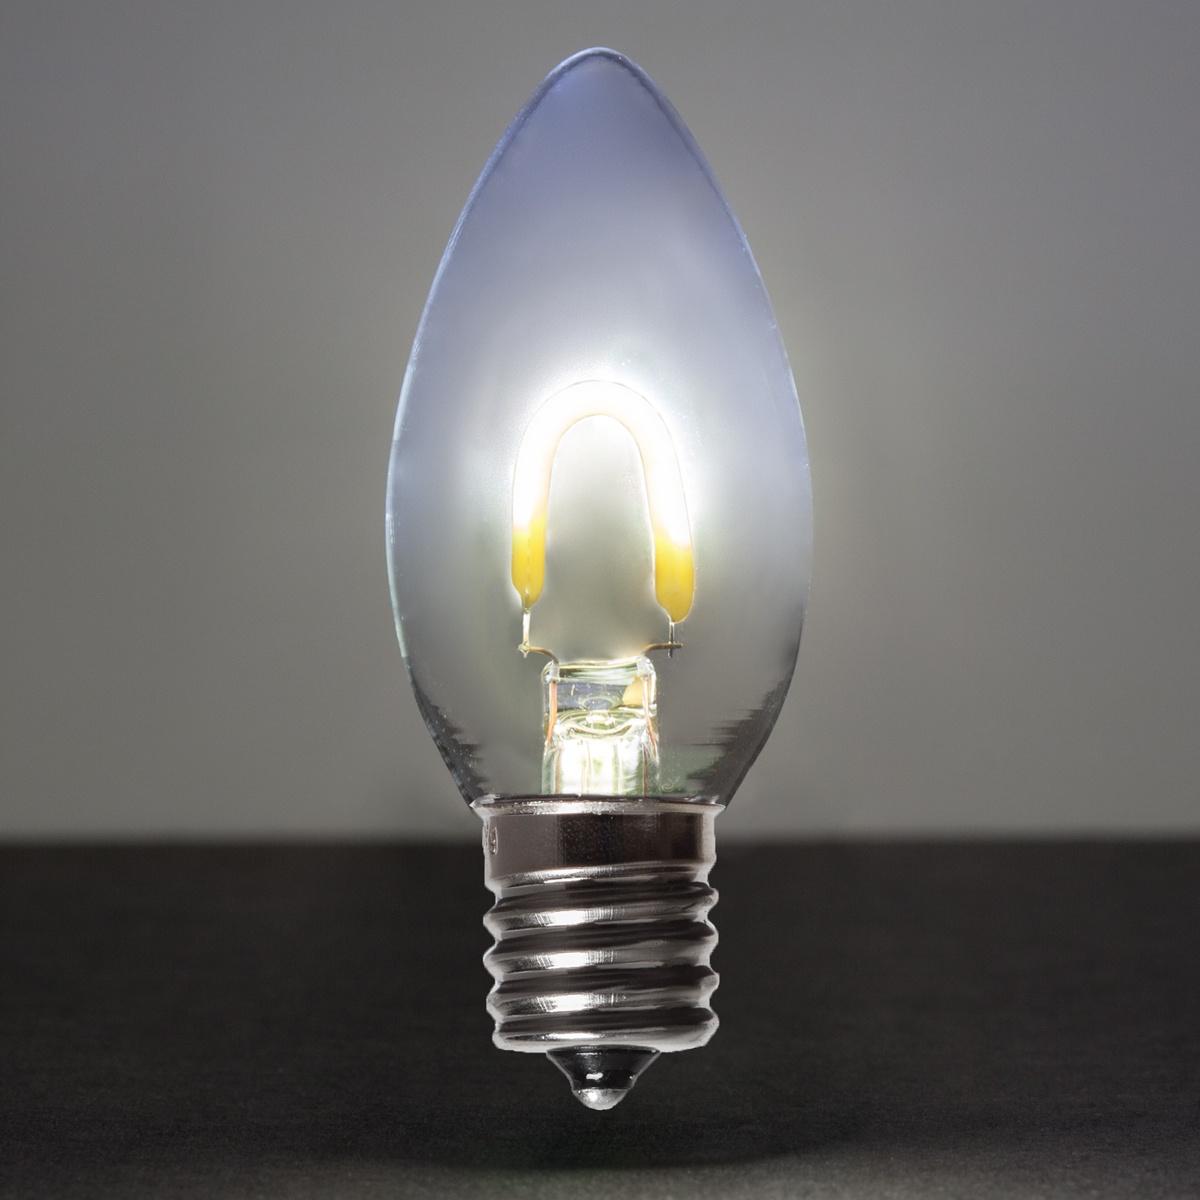 C9 Christmas Light Bulbs For Sale C9 Lamps For Sale C9: C9 Cool White Glass FlexFilament TM LED Vintage Christmas